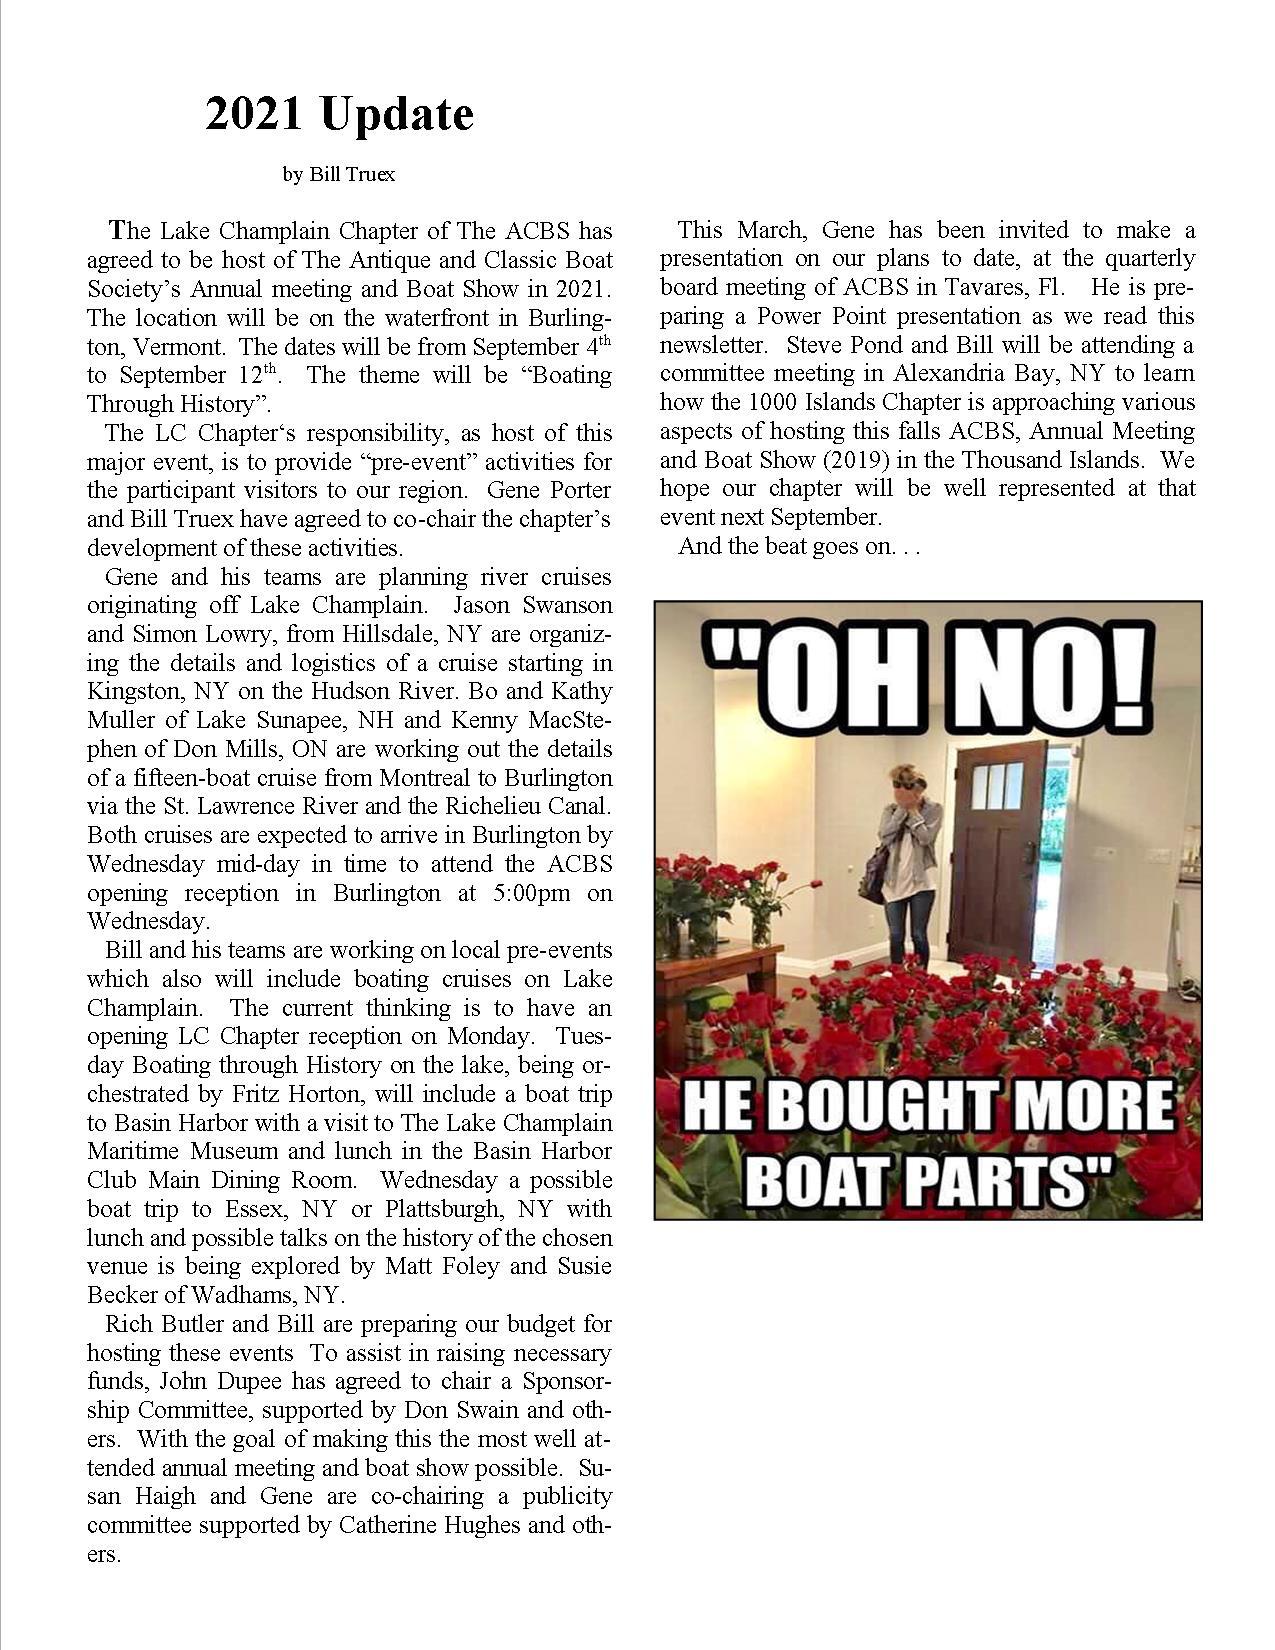 LCACBS Newletter 3.1.19 7.jpg